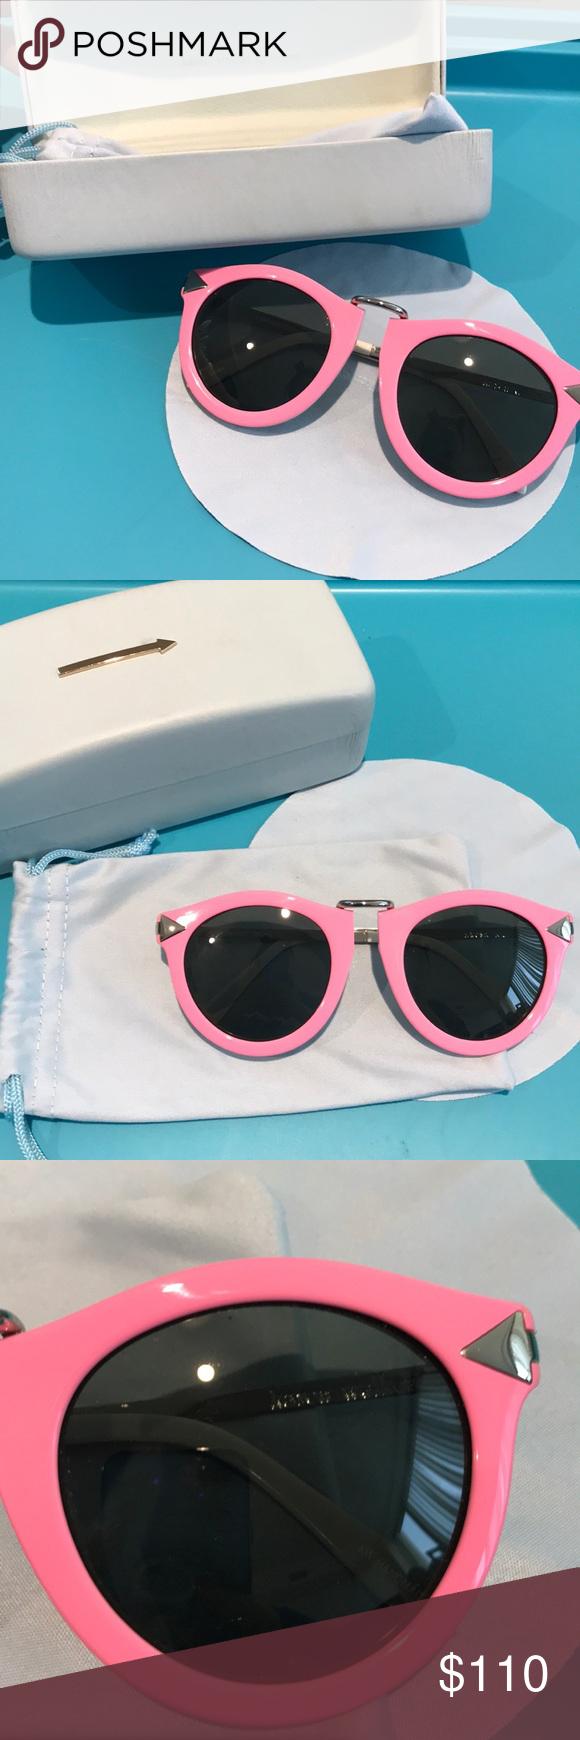 5e215bdbd95 Authentic karen walker sunglasses 🕶 Brand new authentic karen walker  eyewear harvest pink sunglasses 😎 super